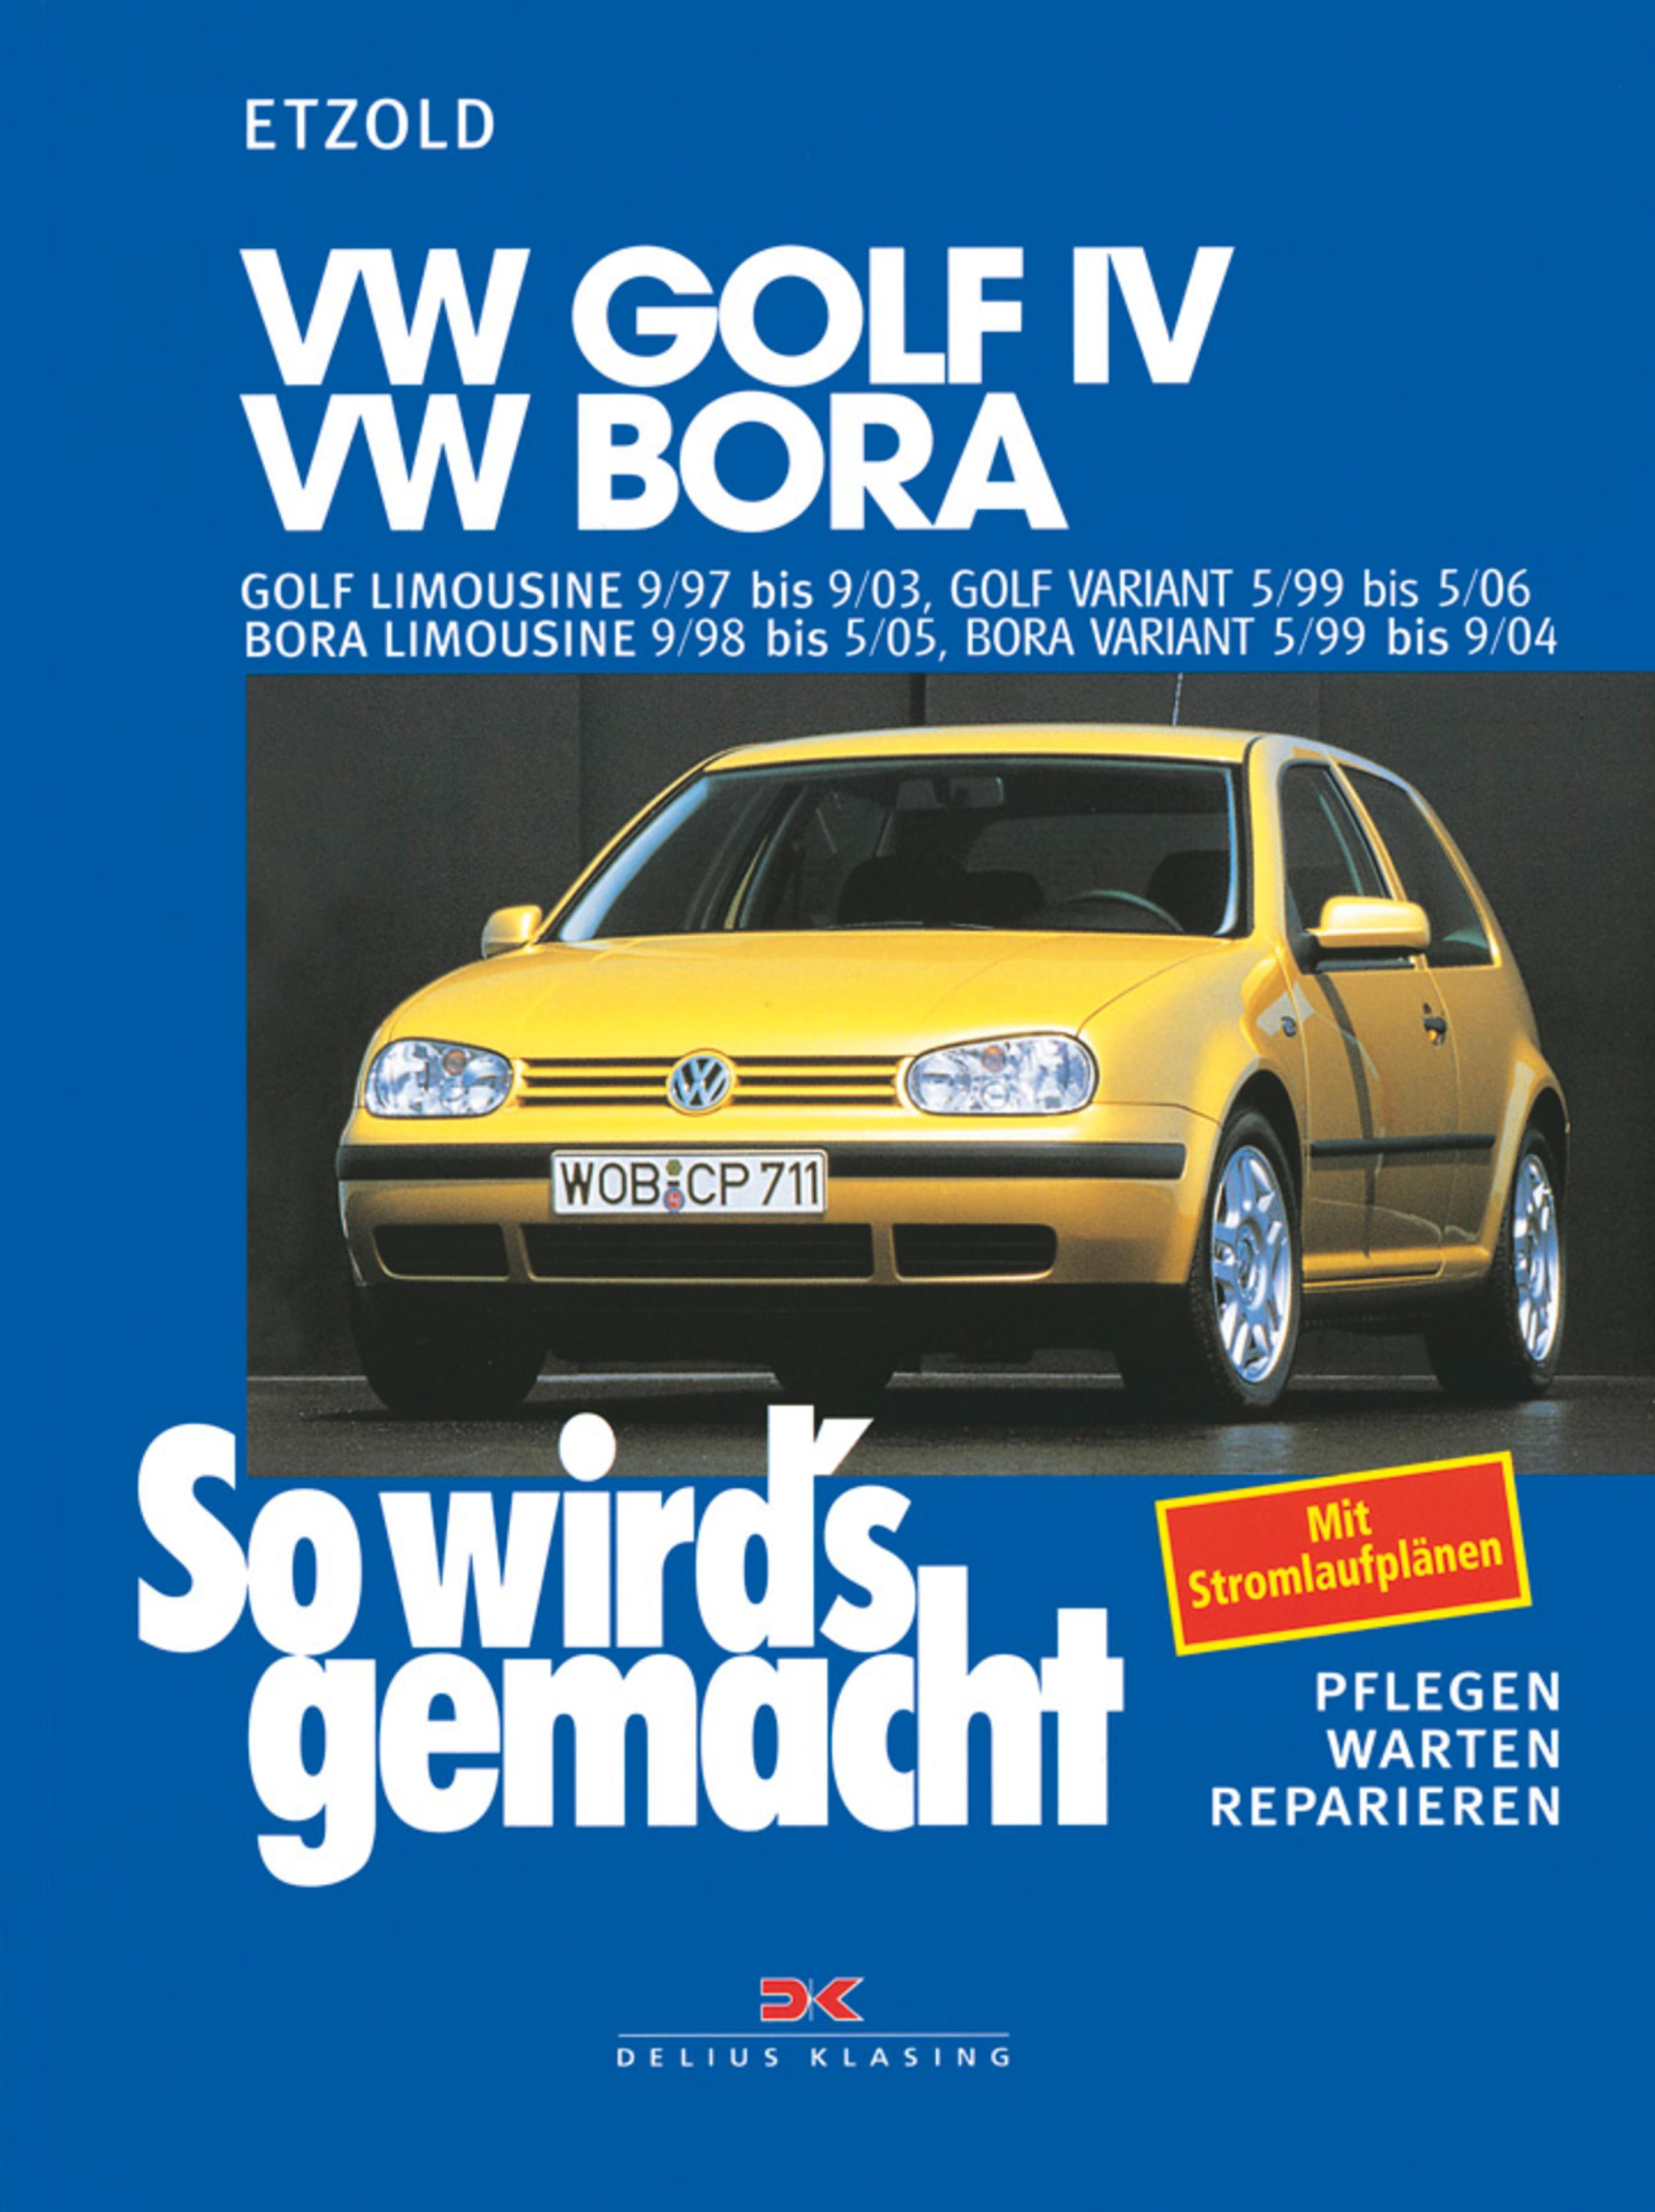 Rüdiger Etzold VW Golf IV 9/97 bis 9/03, Bora 9/98 5/05